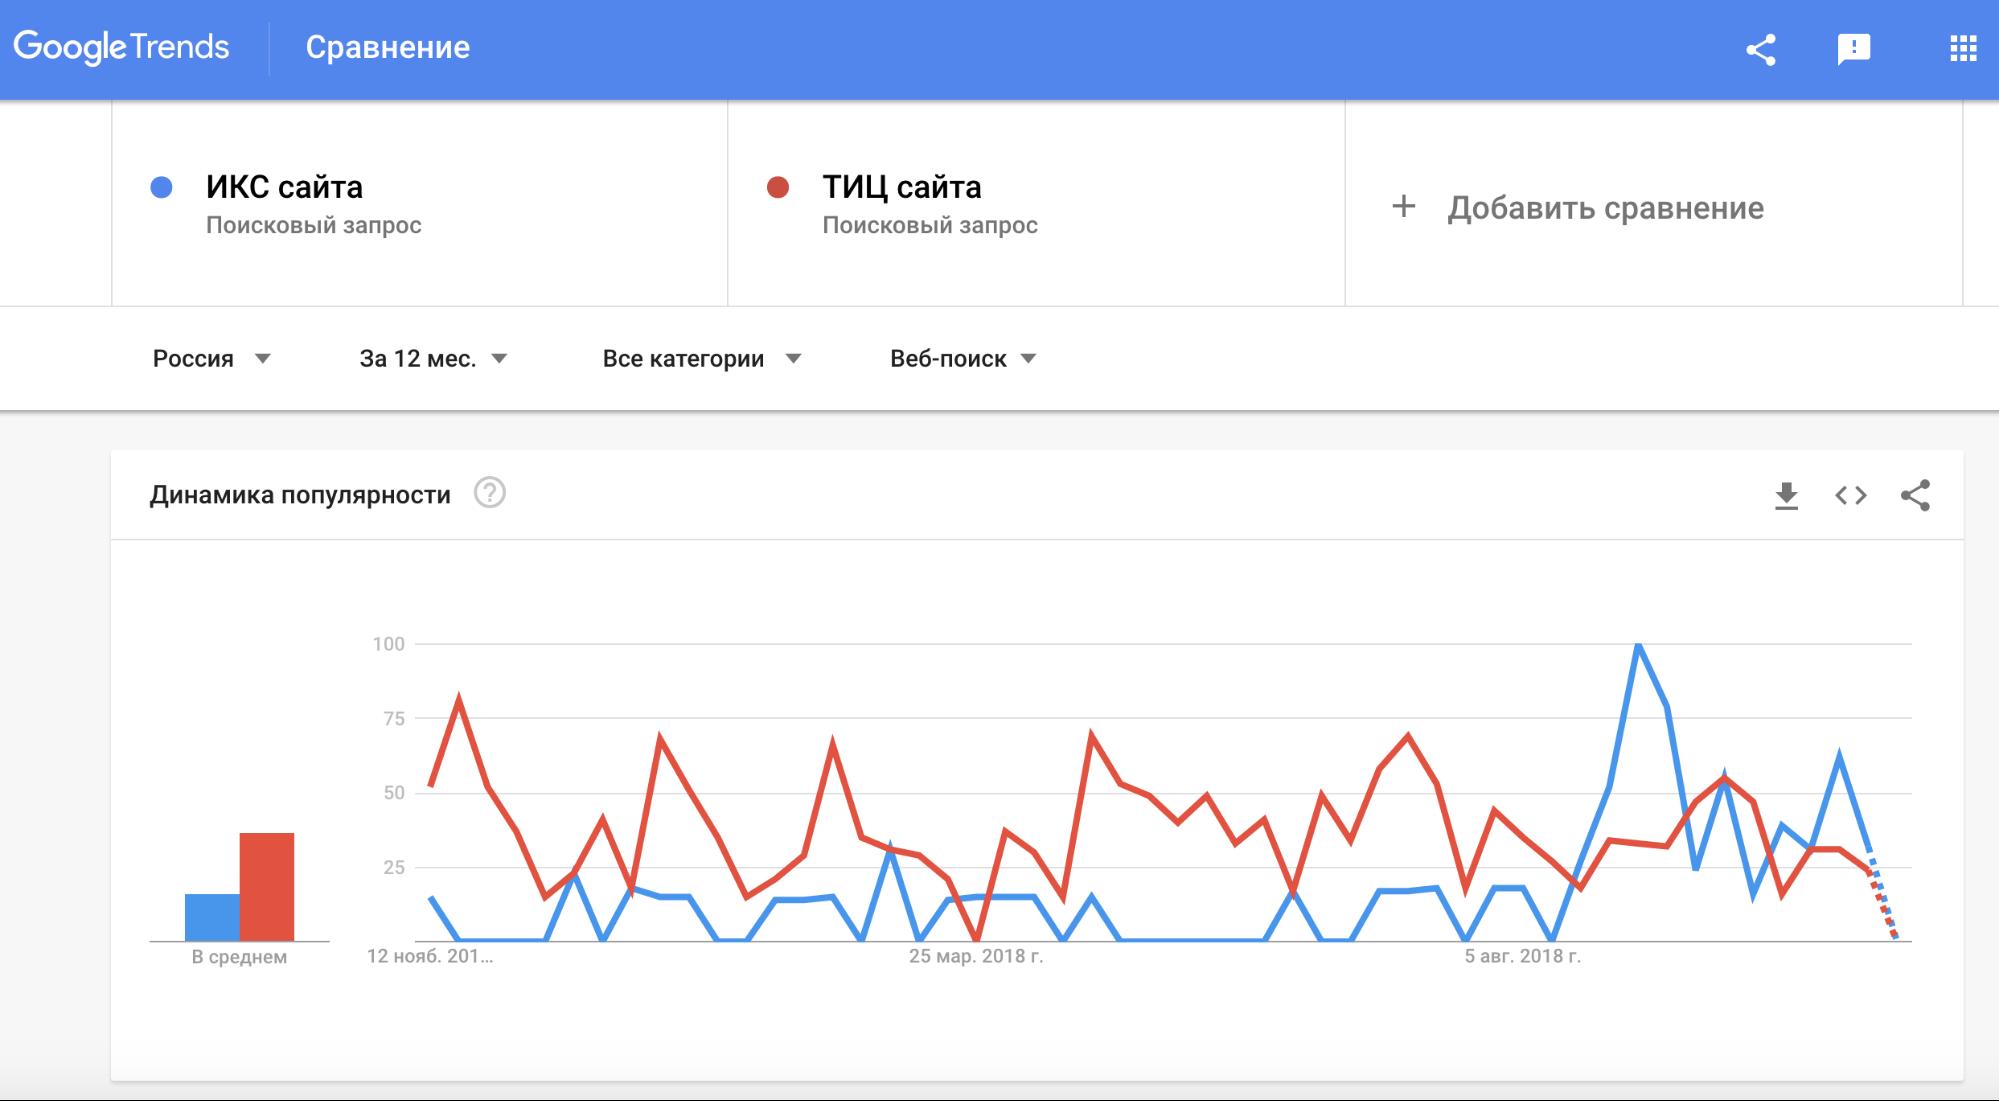 Рис. 2. Динамика популярности запросов «ИКС сайта» и «тИЦ сайта» в Google Trends.